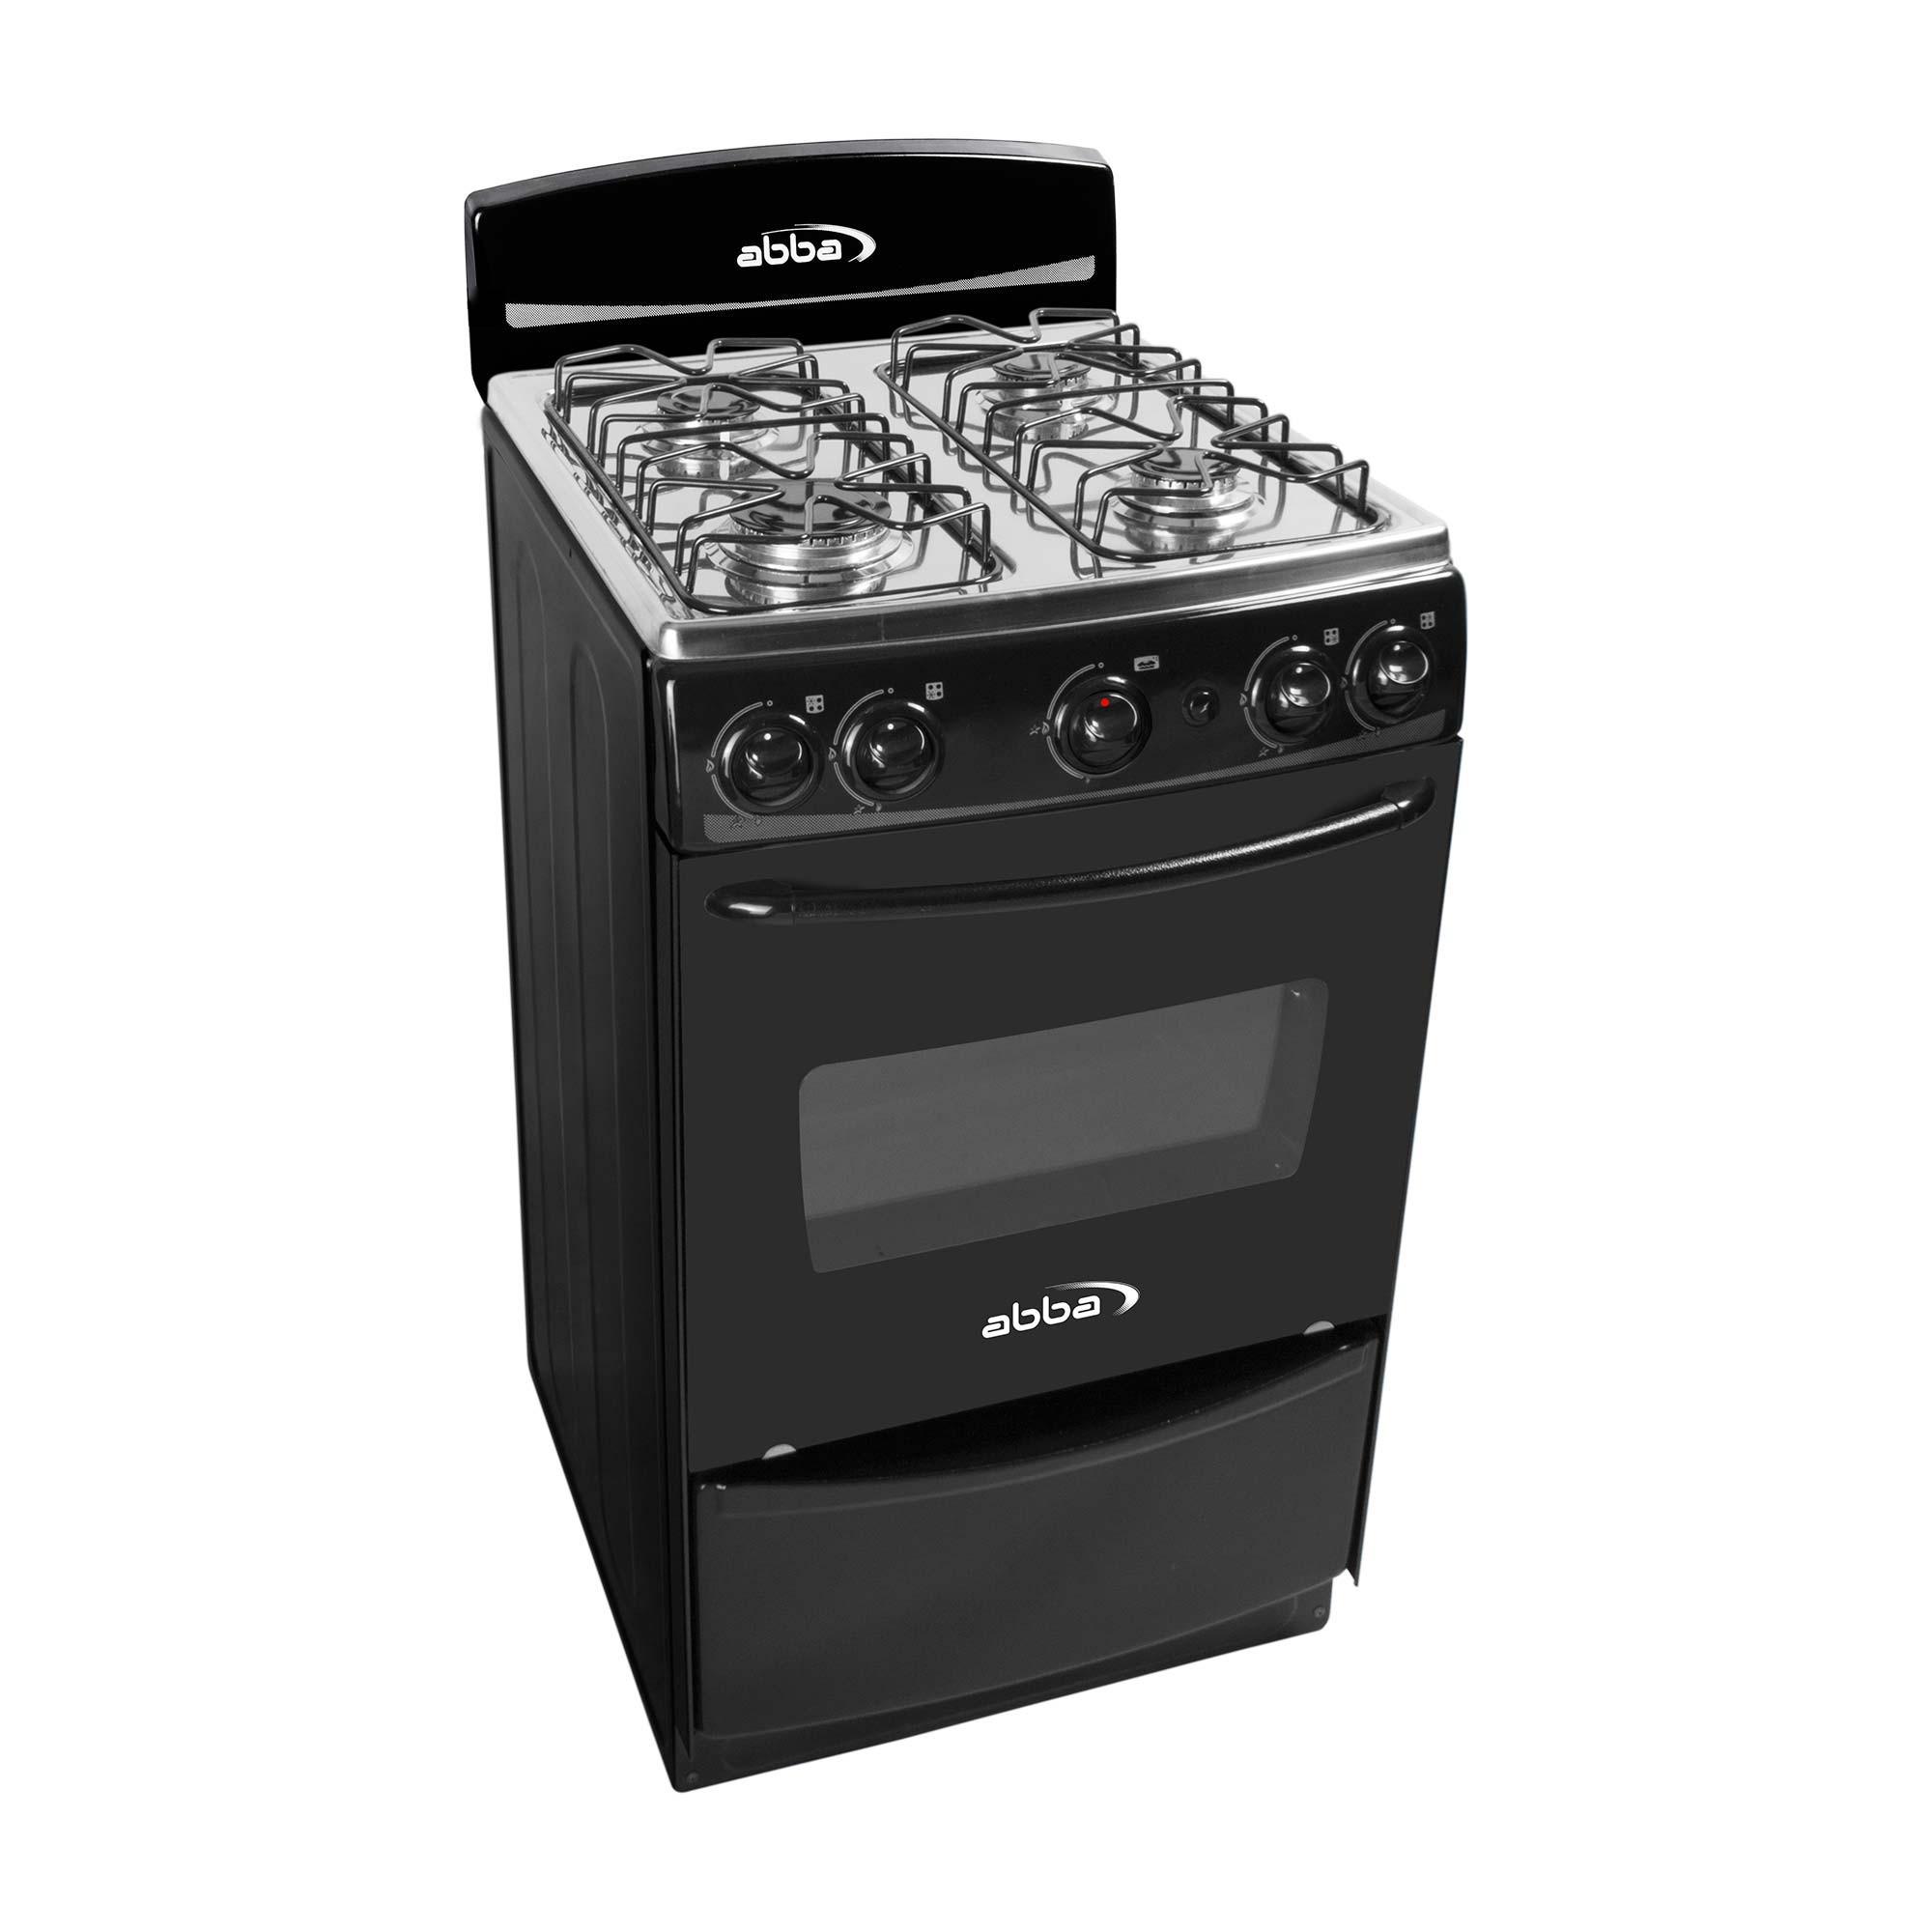 Estufa abba 20 ab1015n n gas natural color negro alkosto - Queroseno para estufas precio ...